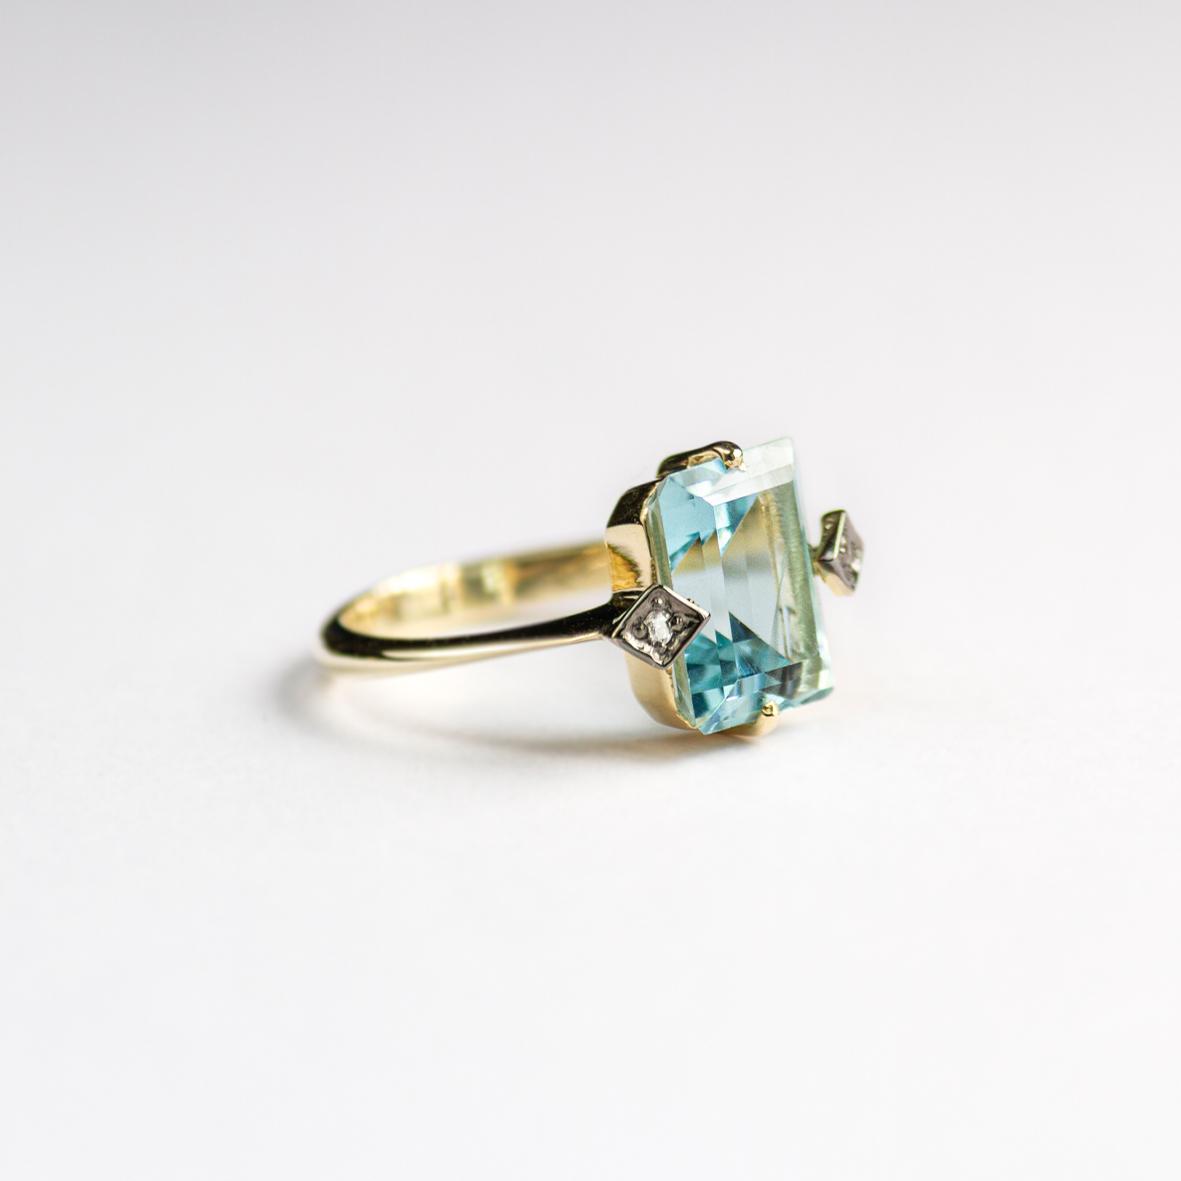 3. OONA_gems of ceylon_ficha2_blue aquamarine ring